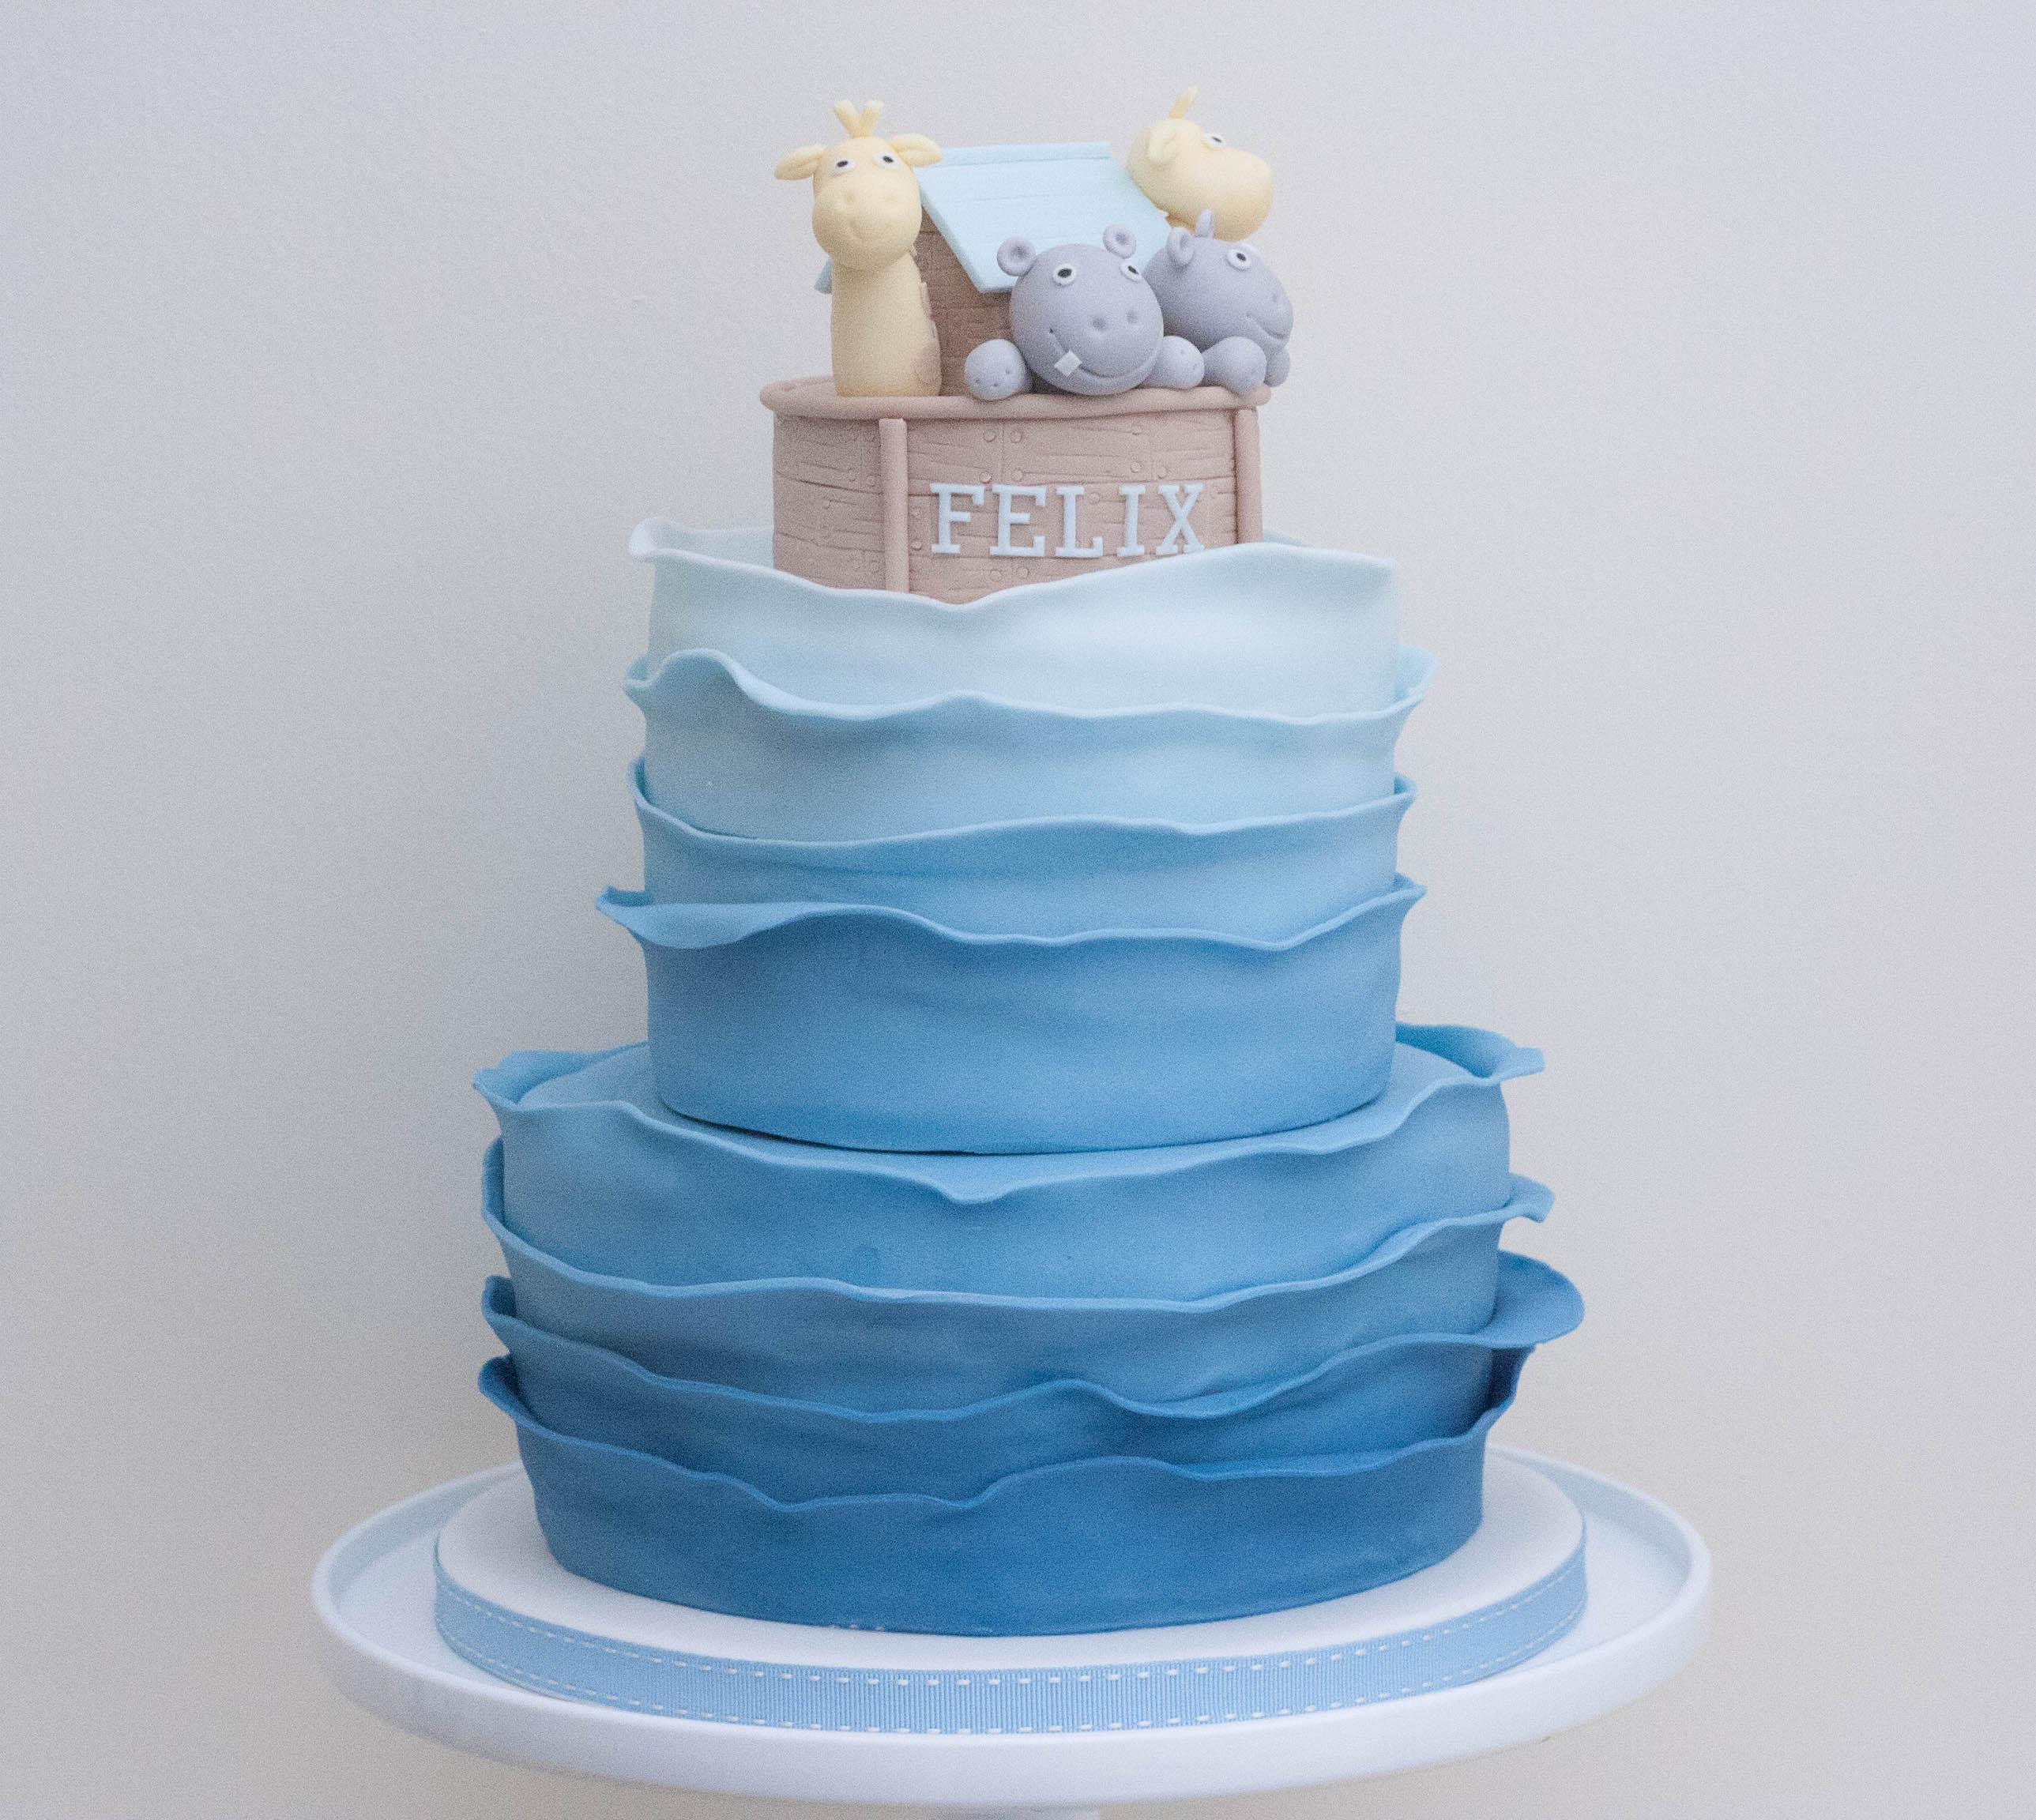 Noah's ark waves cake